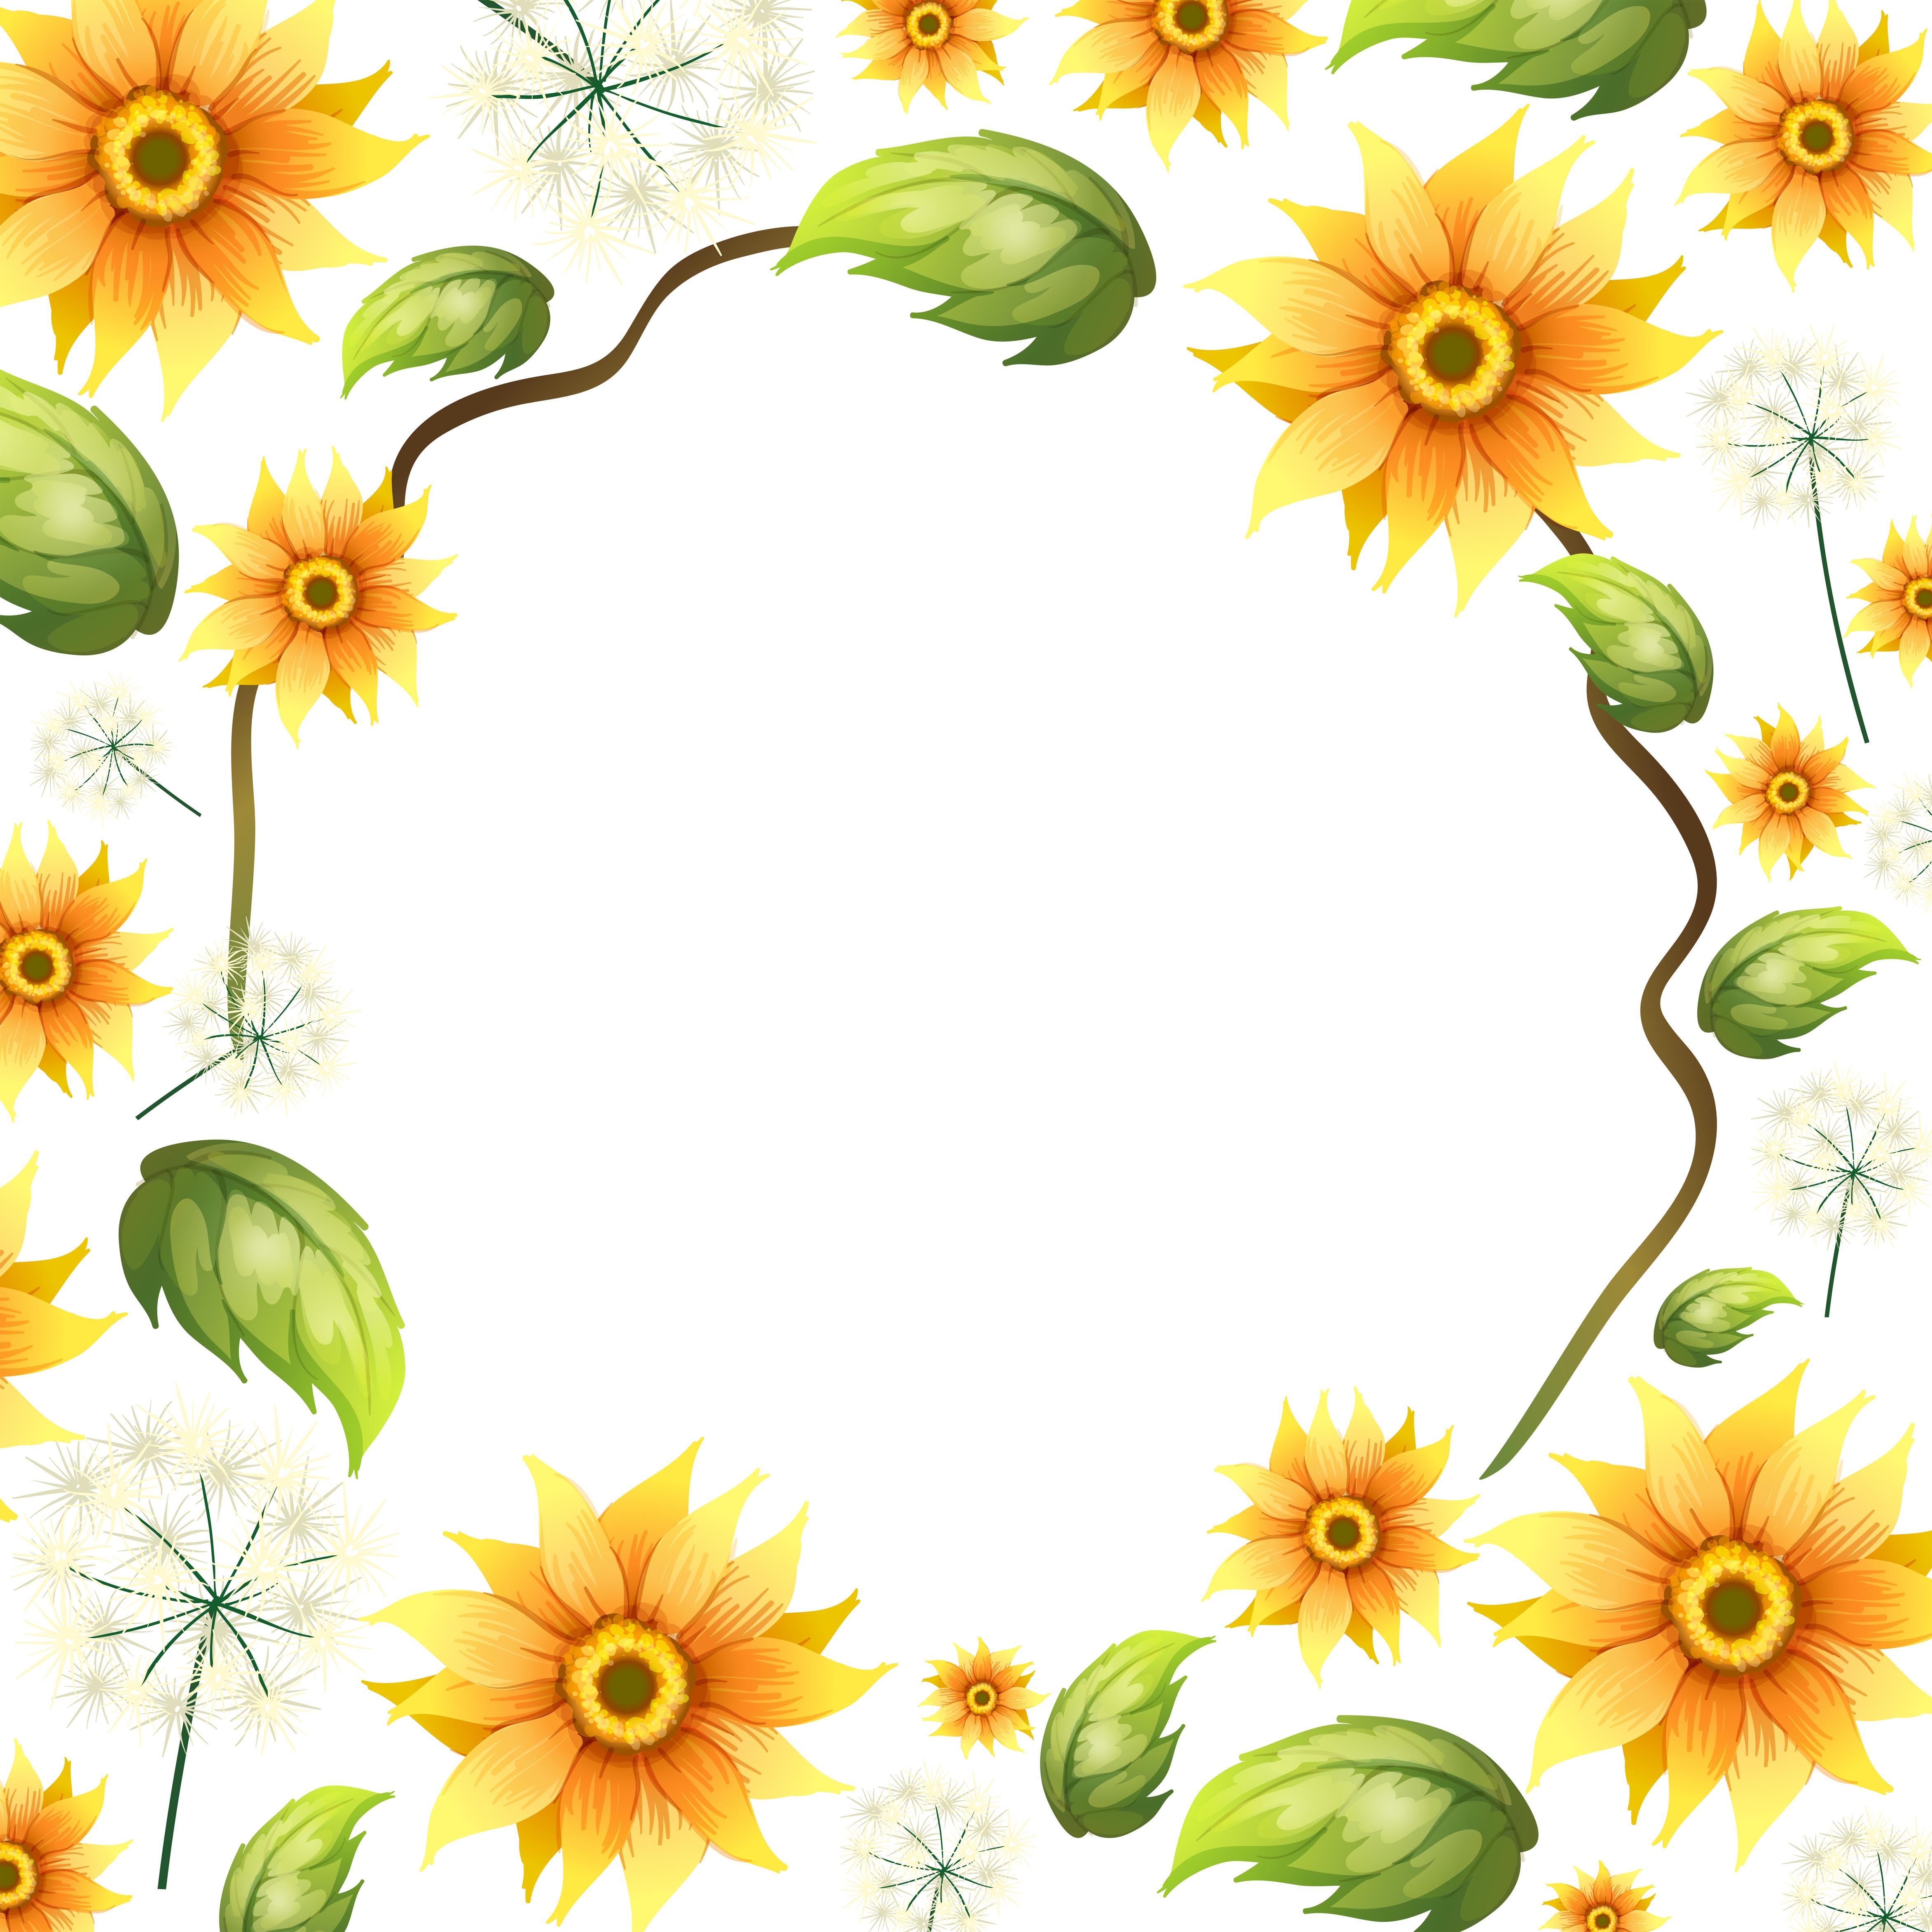 Sunflower Clipart - (38929 Free Downloads)